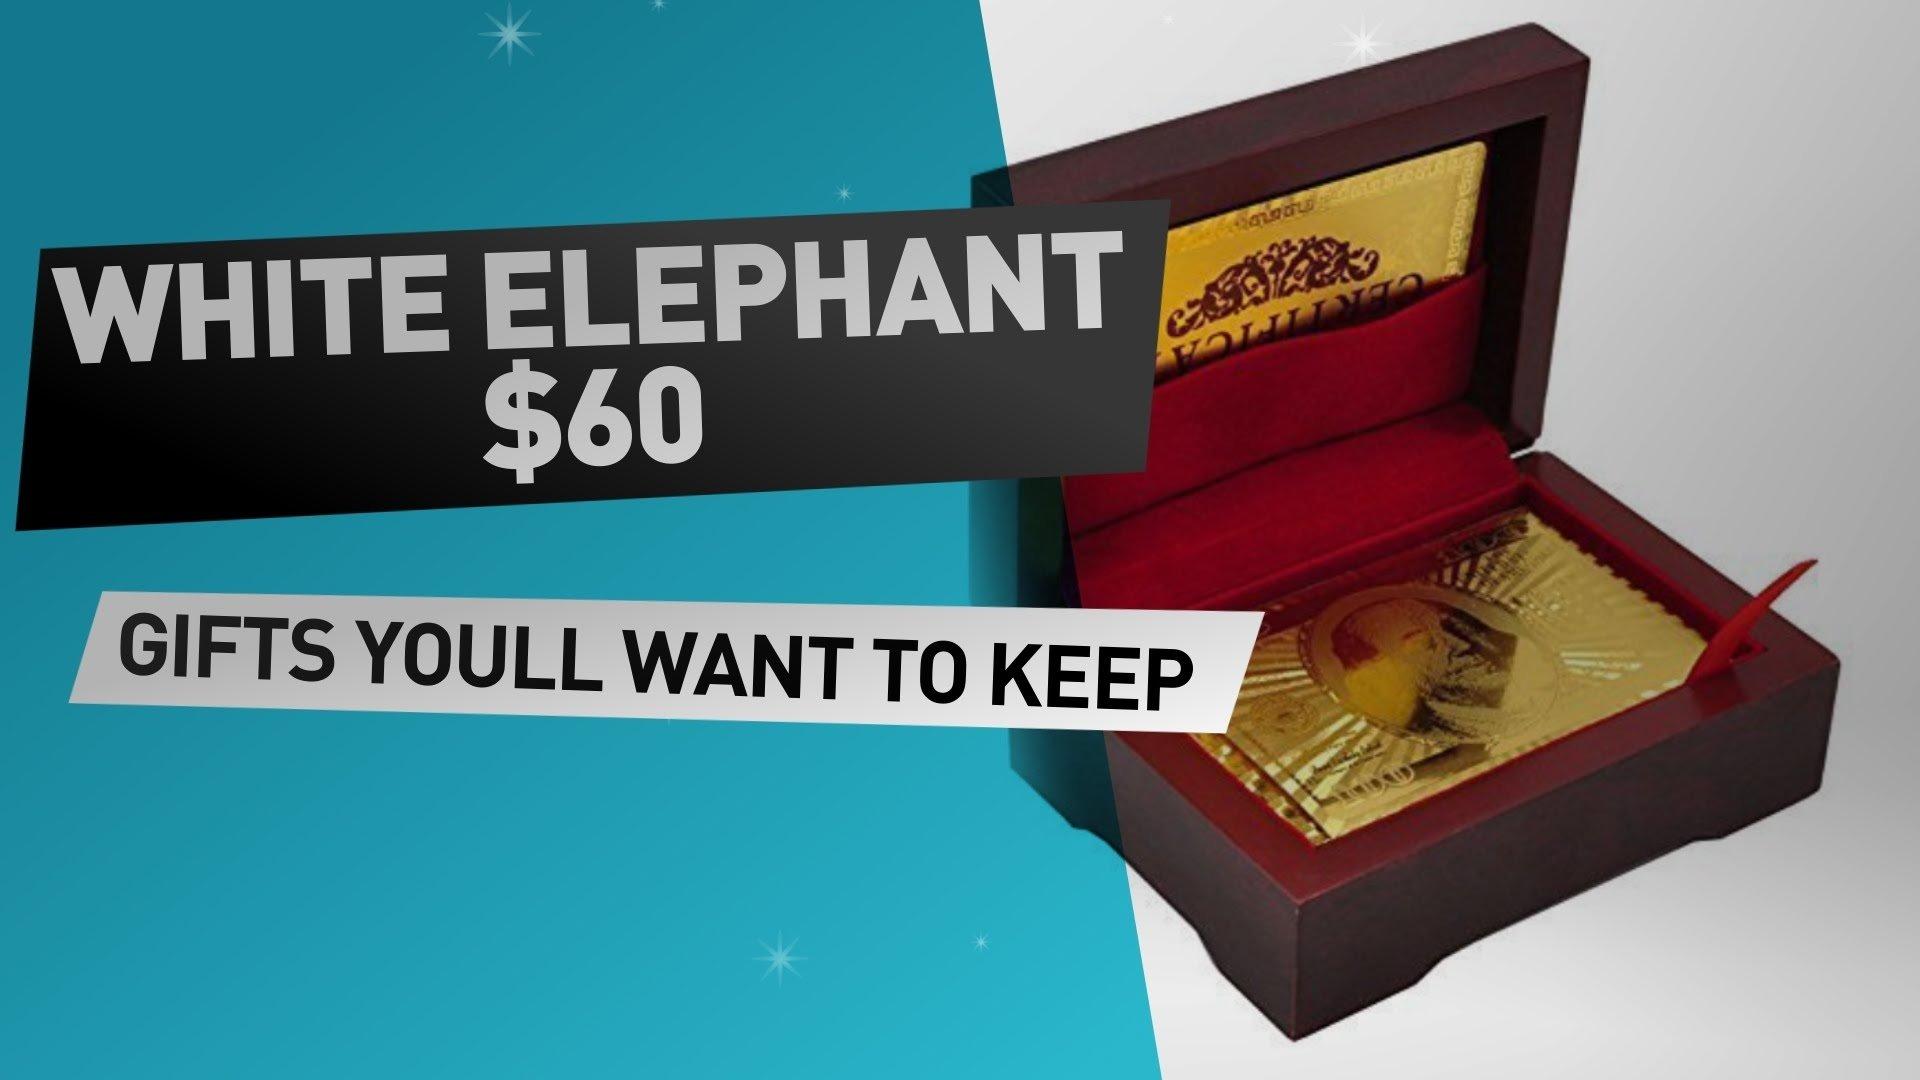 10 Pretty Ideas For White Elephant Gifts white elephant gifts under 60 dollar great white elephant gift 2020